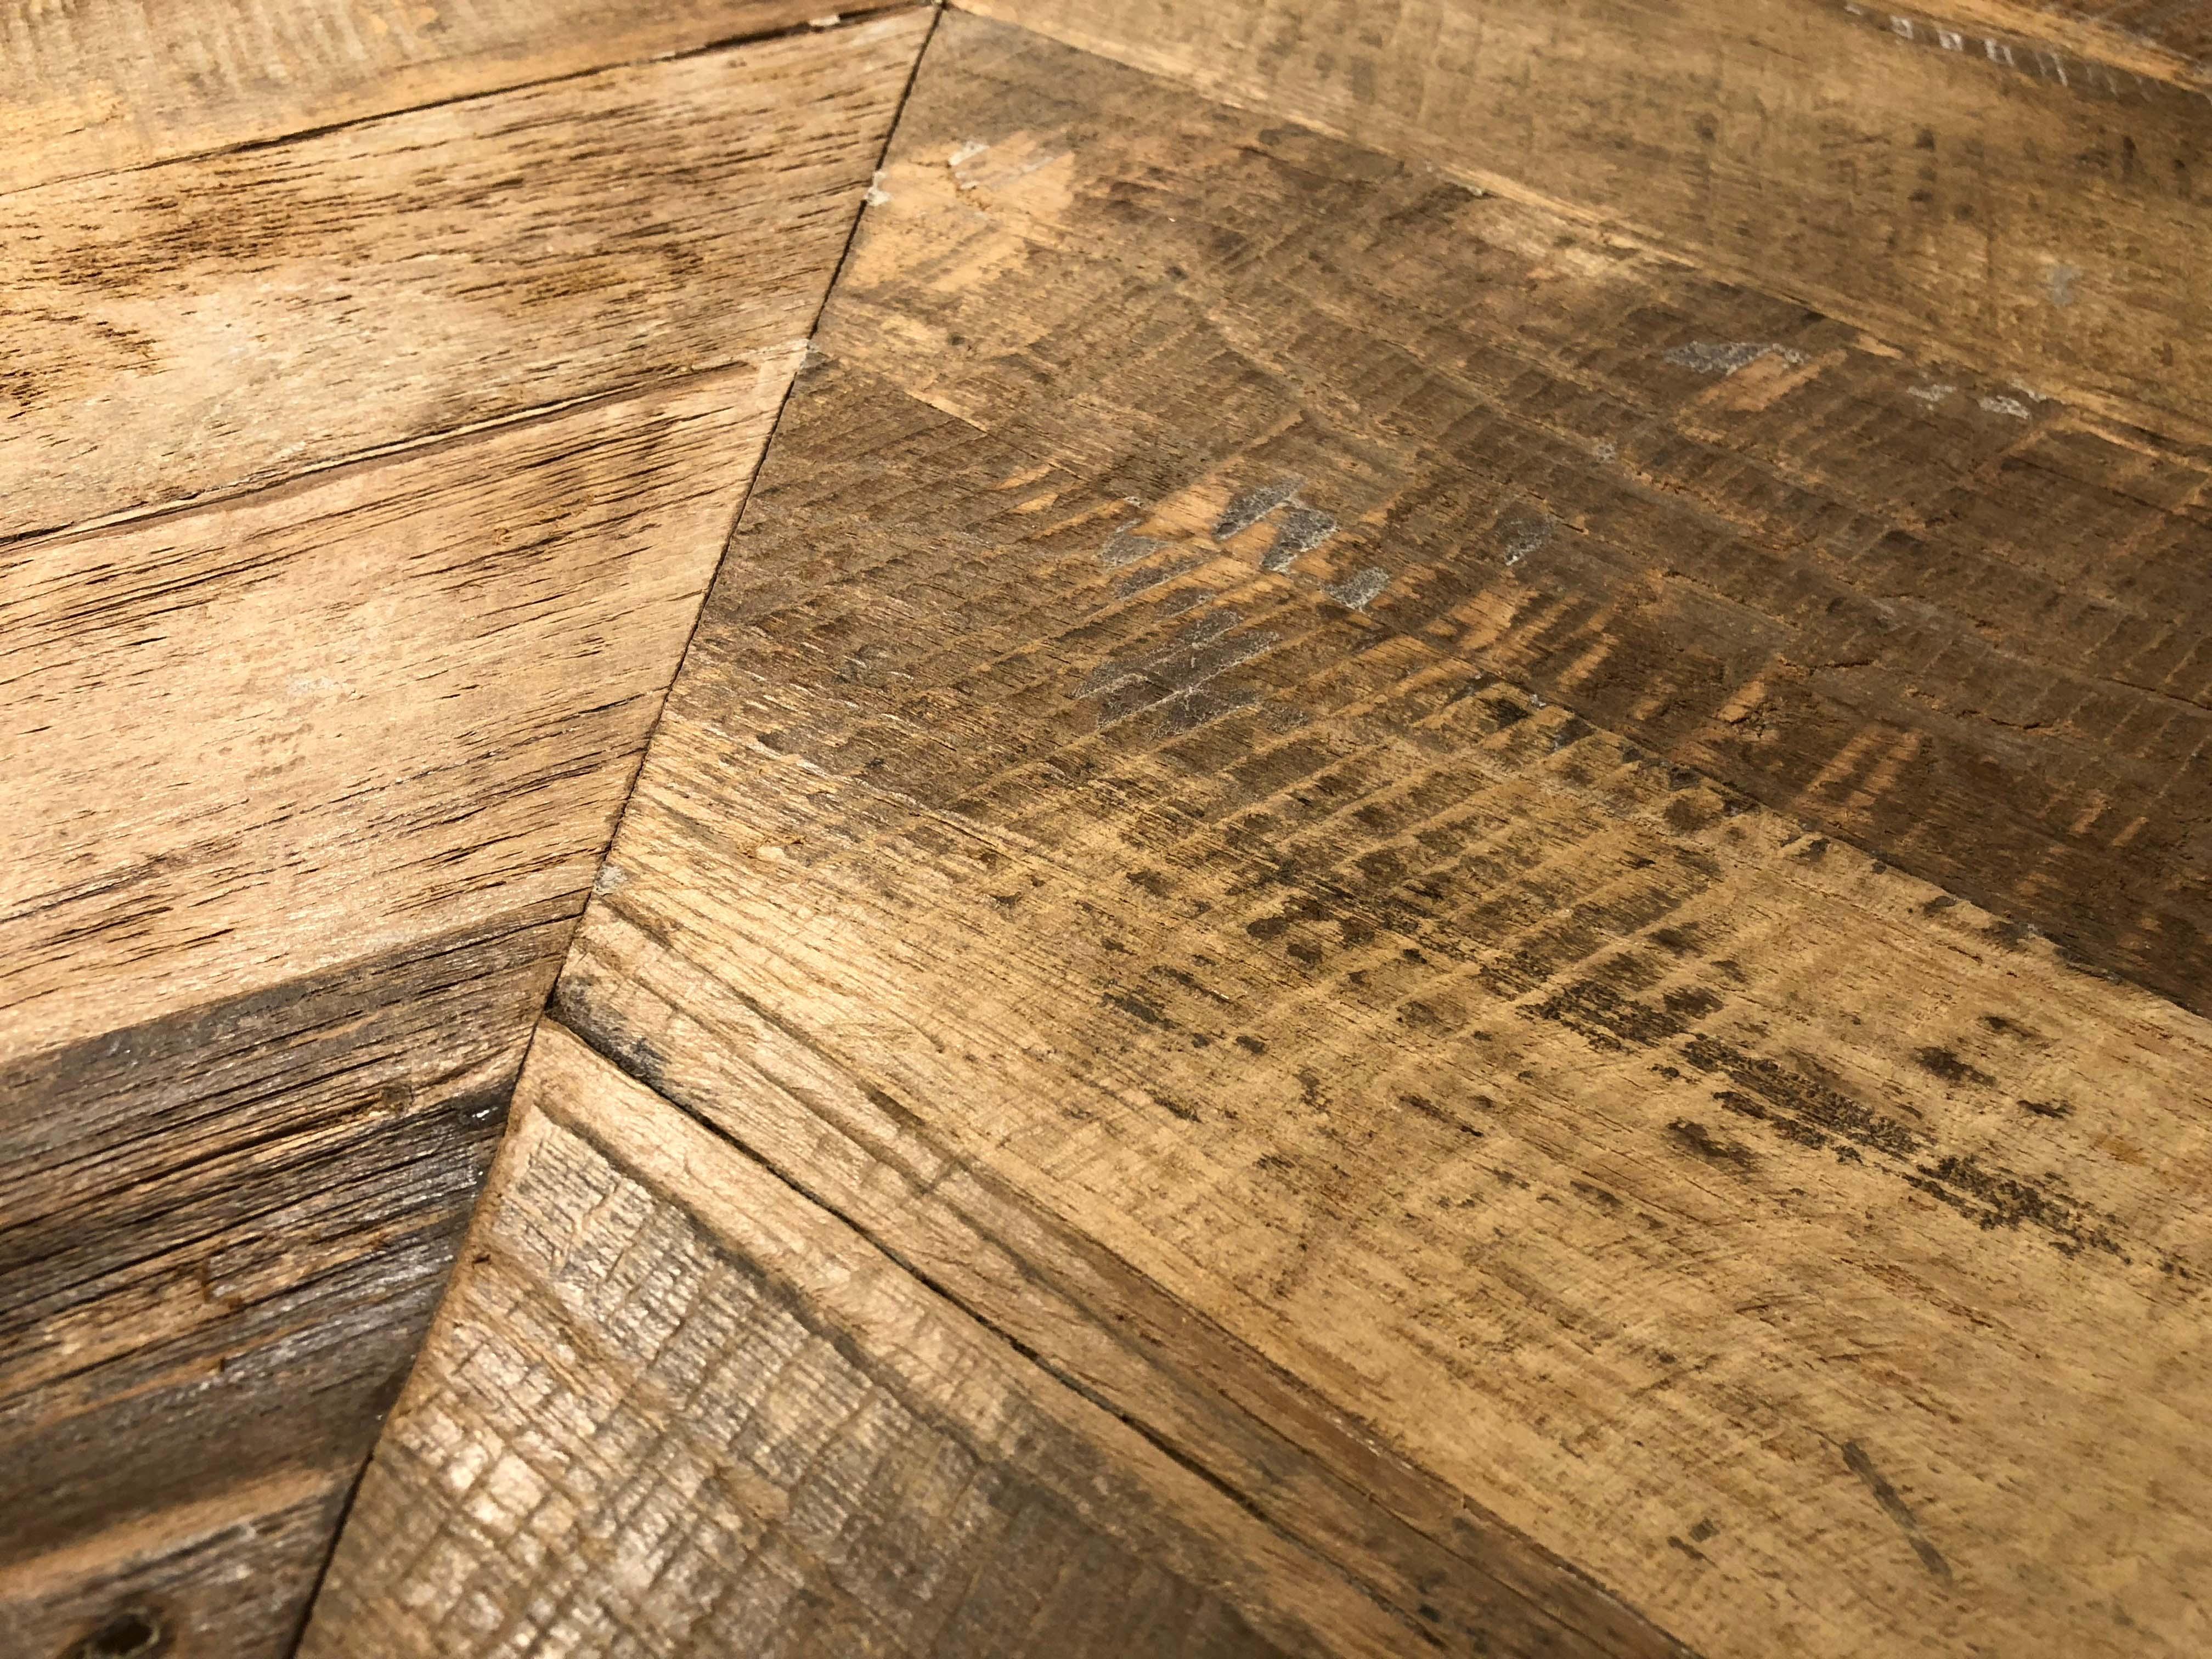 chevron patina detail - Reclaimed Teak Plywood Panels